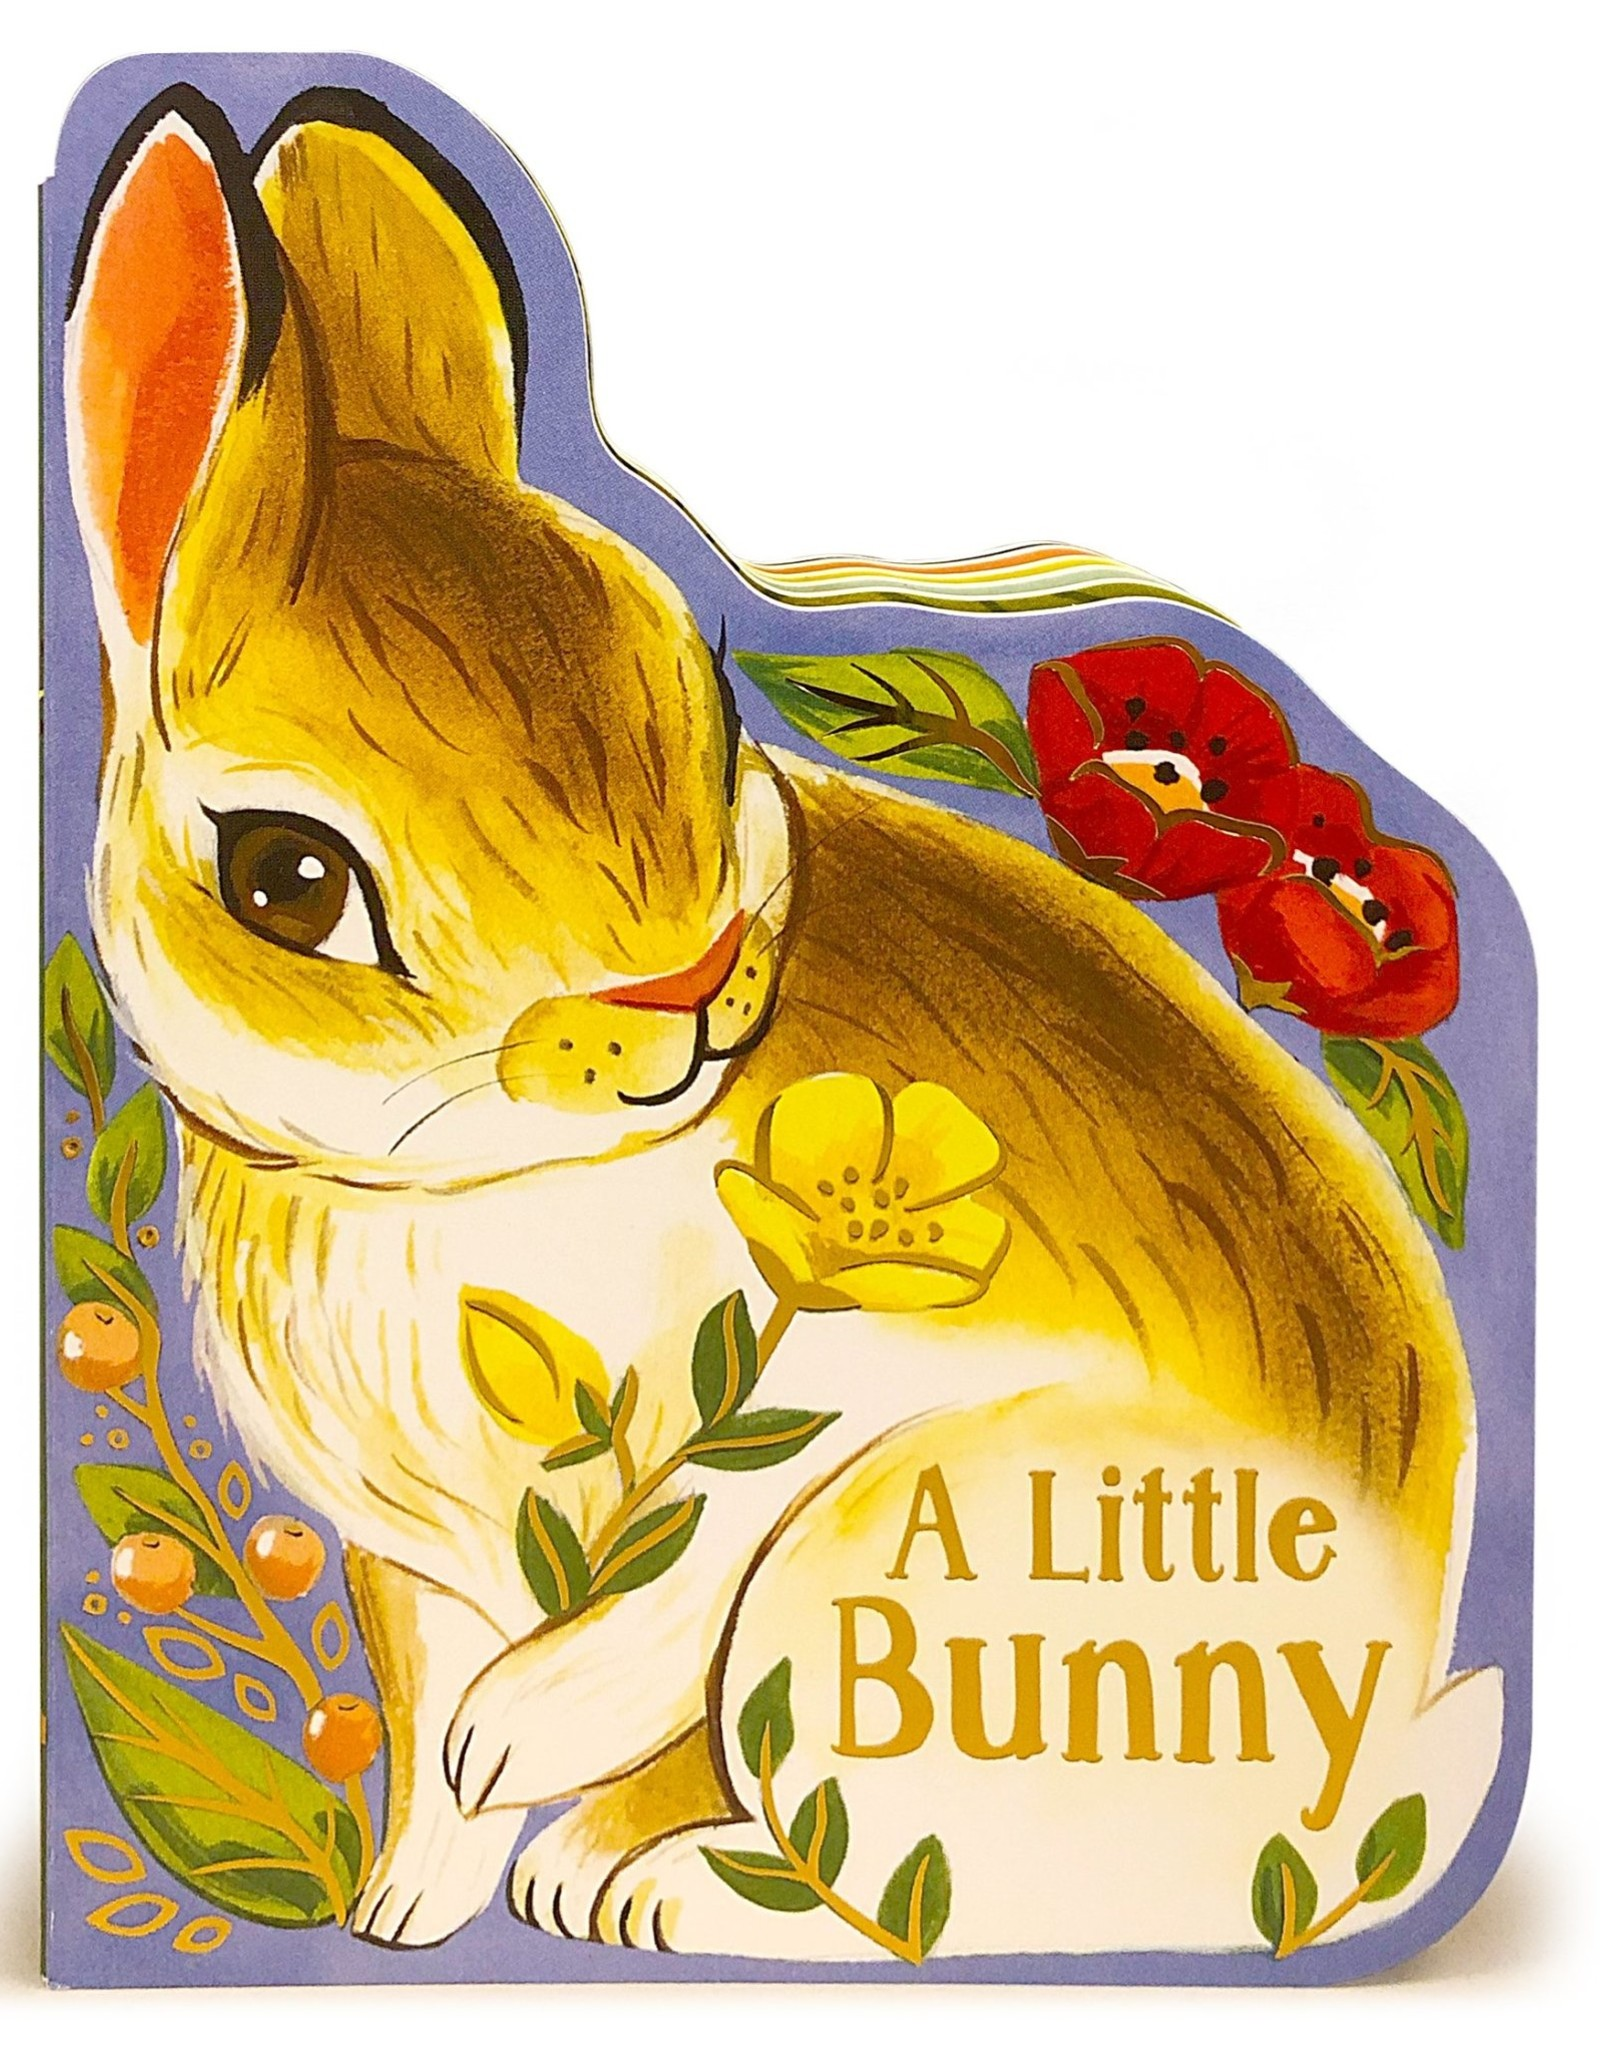 A Little Bunny board book